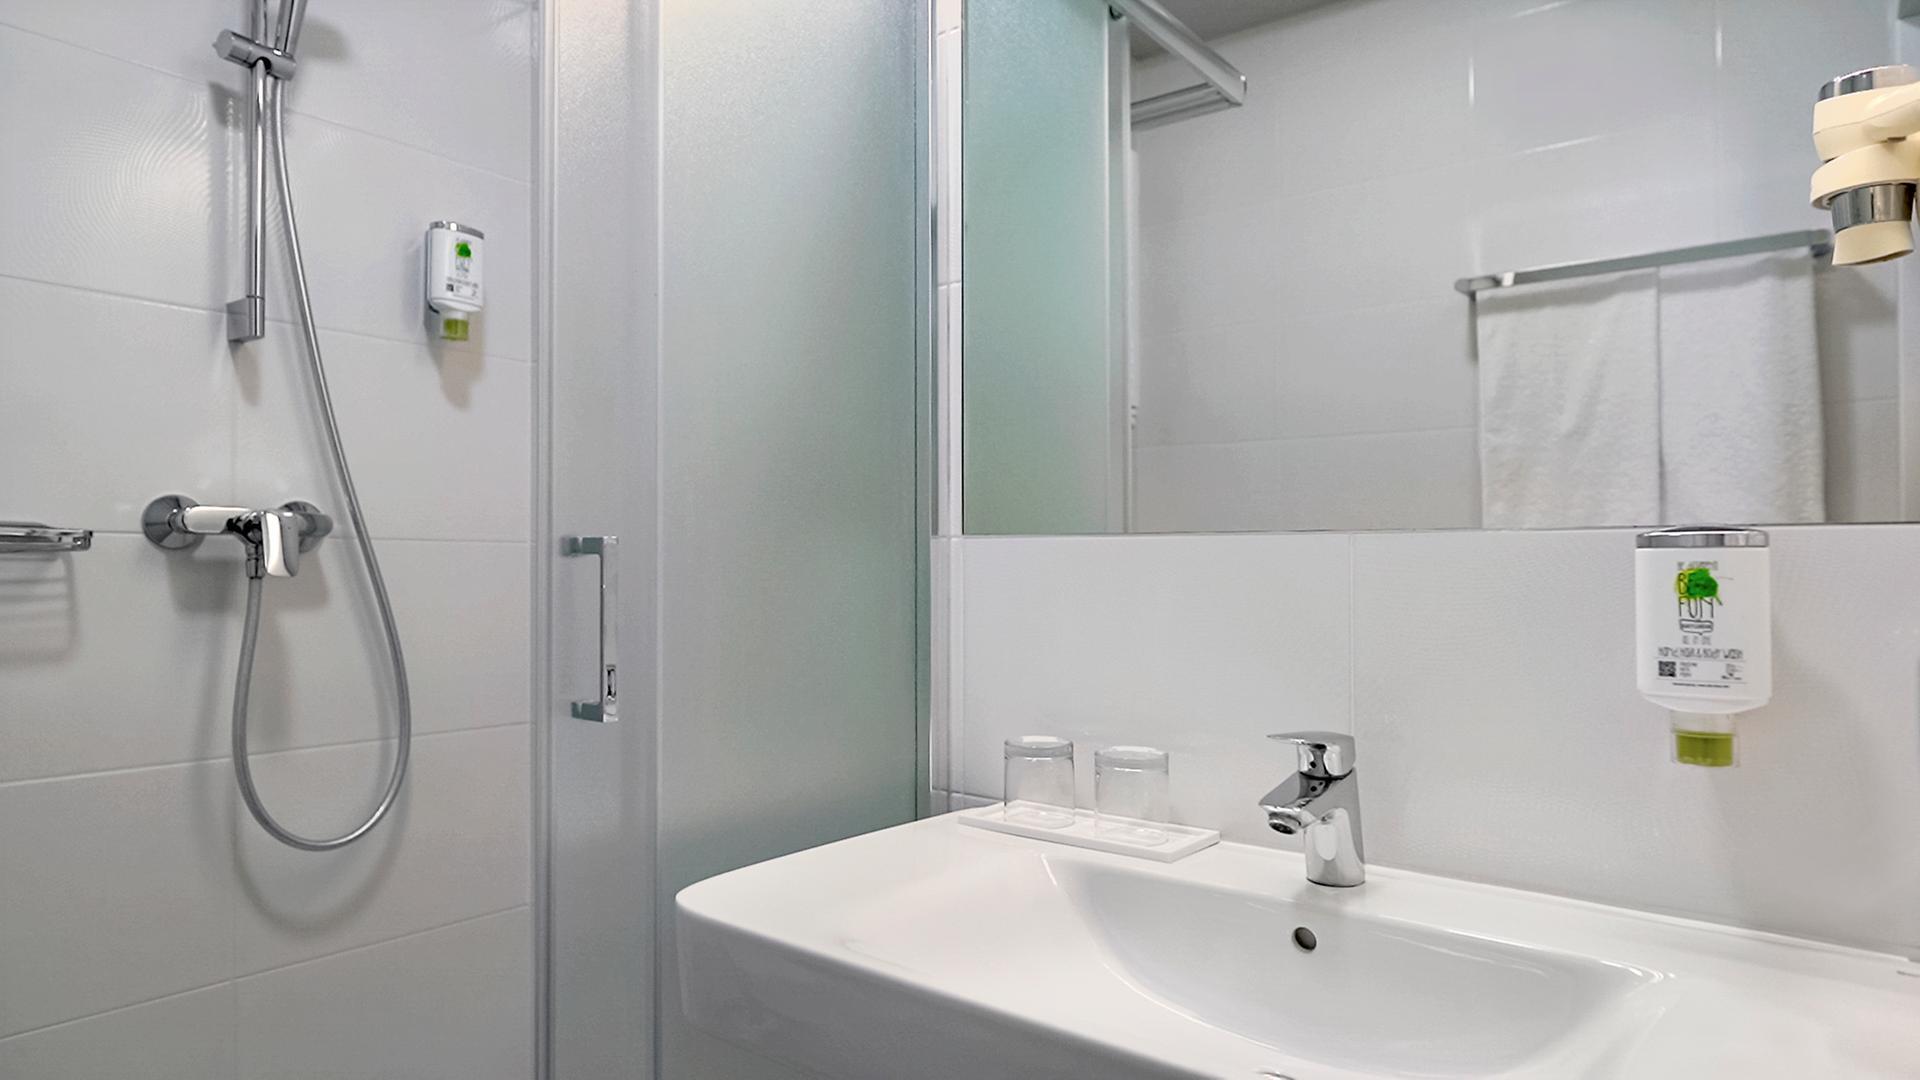 Double Standard Room's Bathroom at Hotel MDM Warsaw